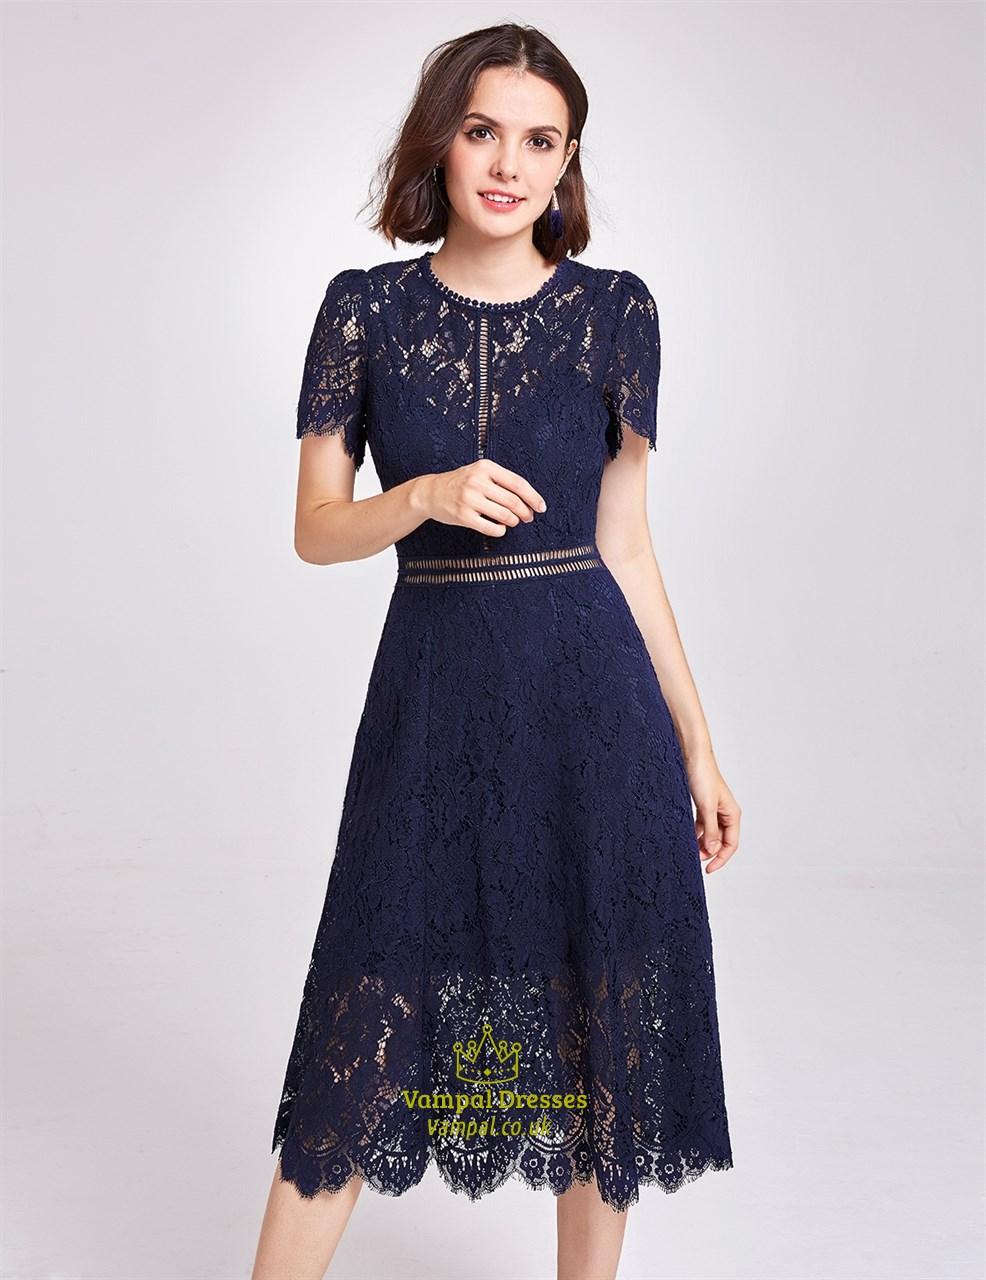 Elegant Navy Blue Short Sleeve A-Line Tea Length Lace Cocktail Dress ...